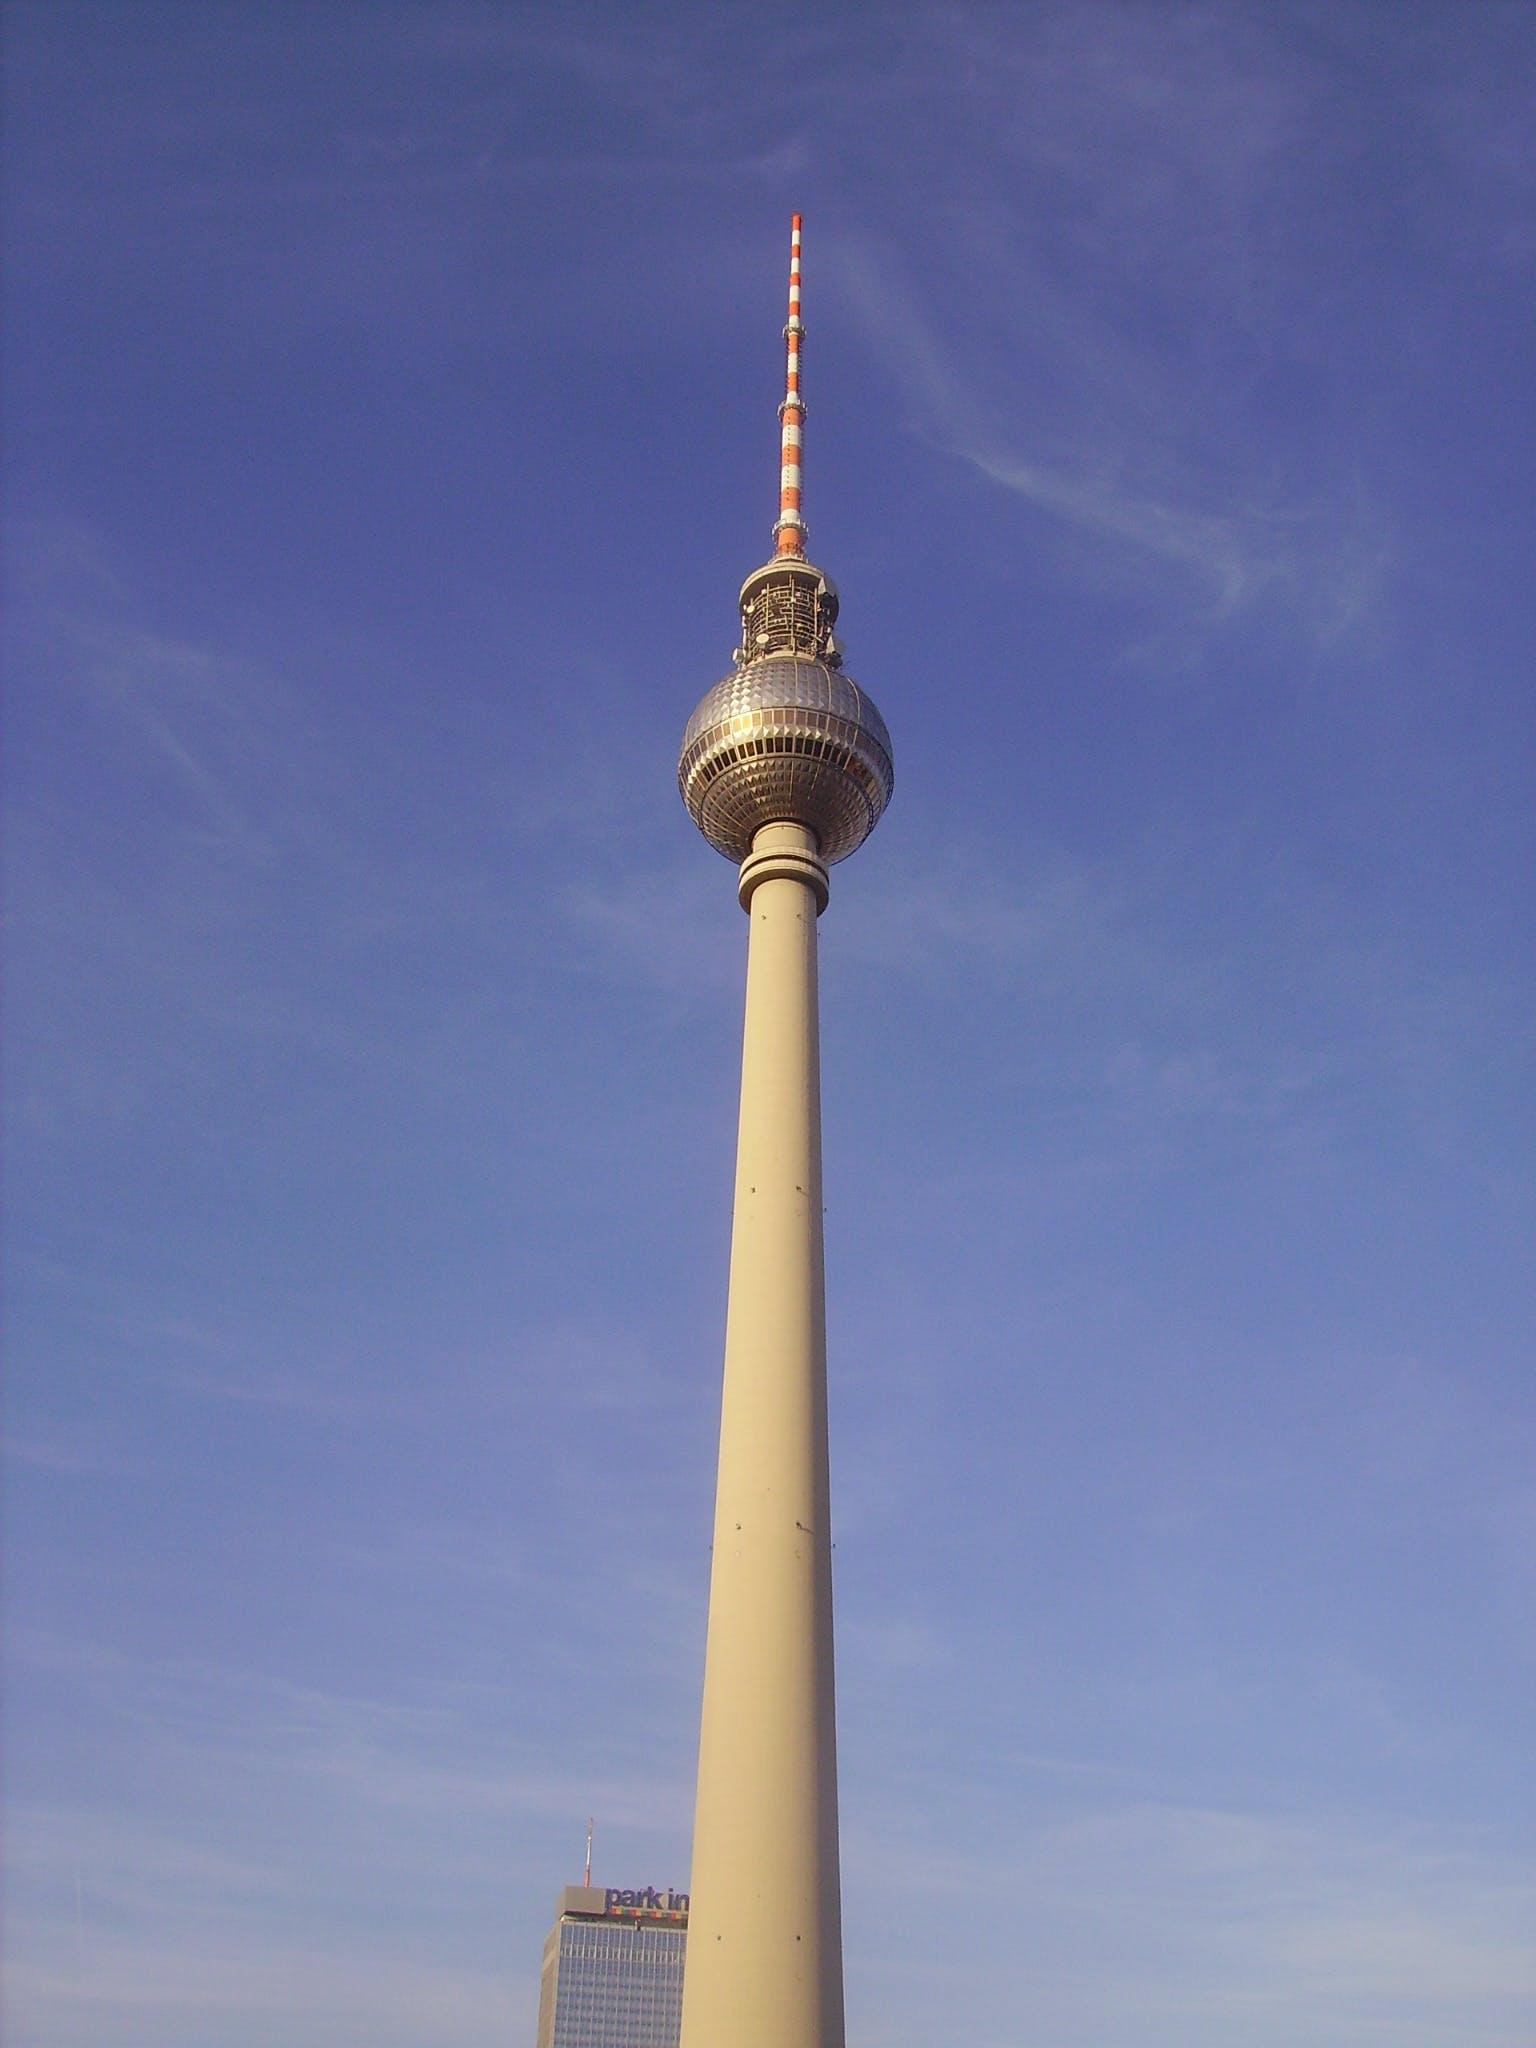 Gratis lagerfoto af Alexanderplatz, berlin, bygning, Fernsehturm